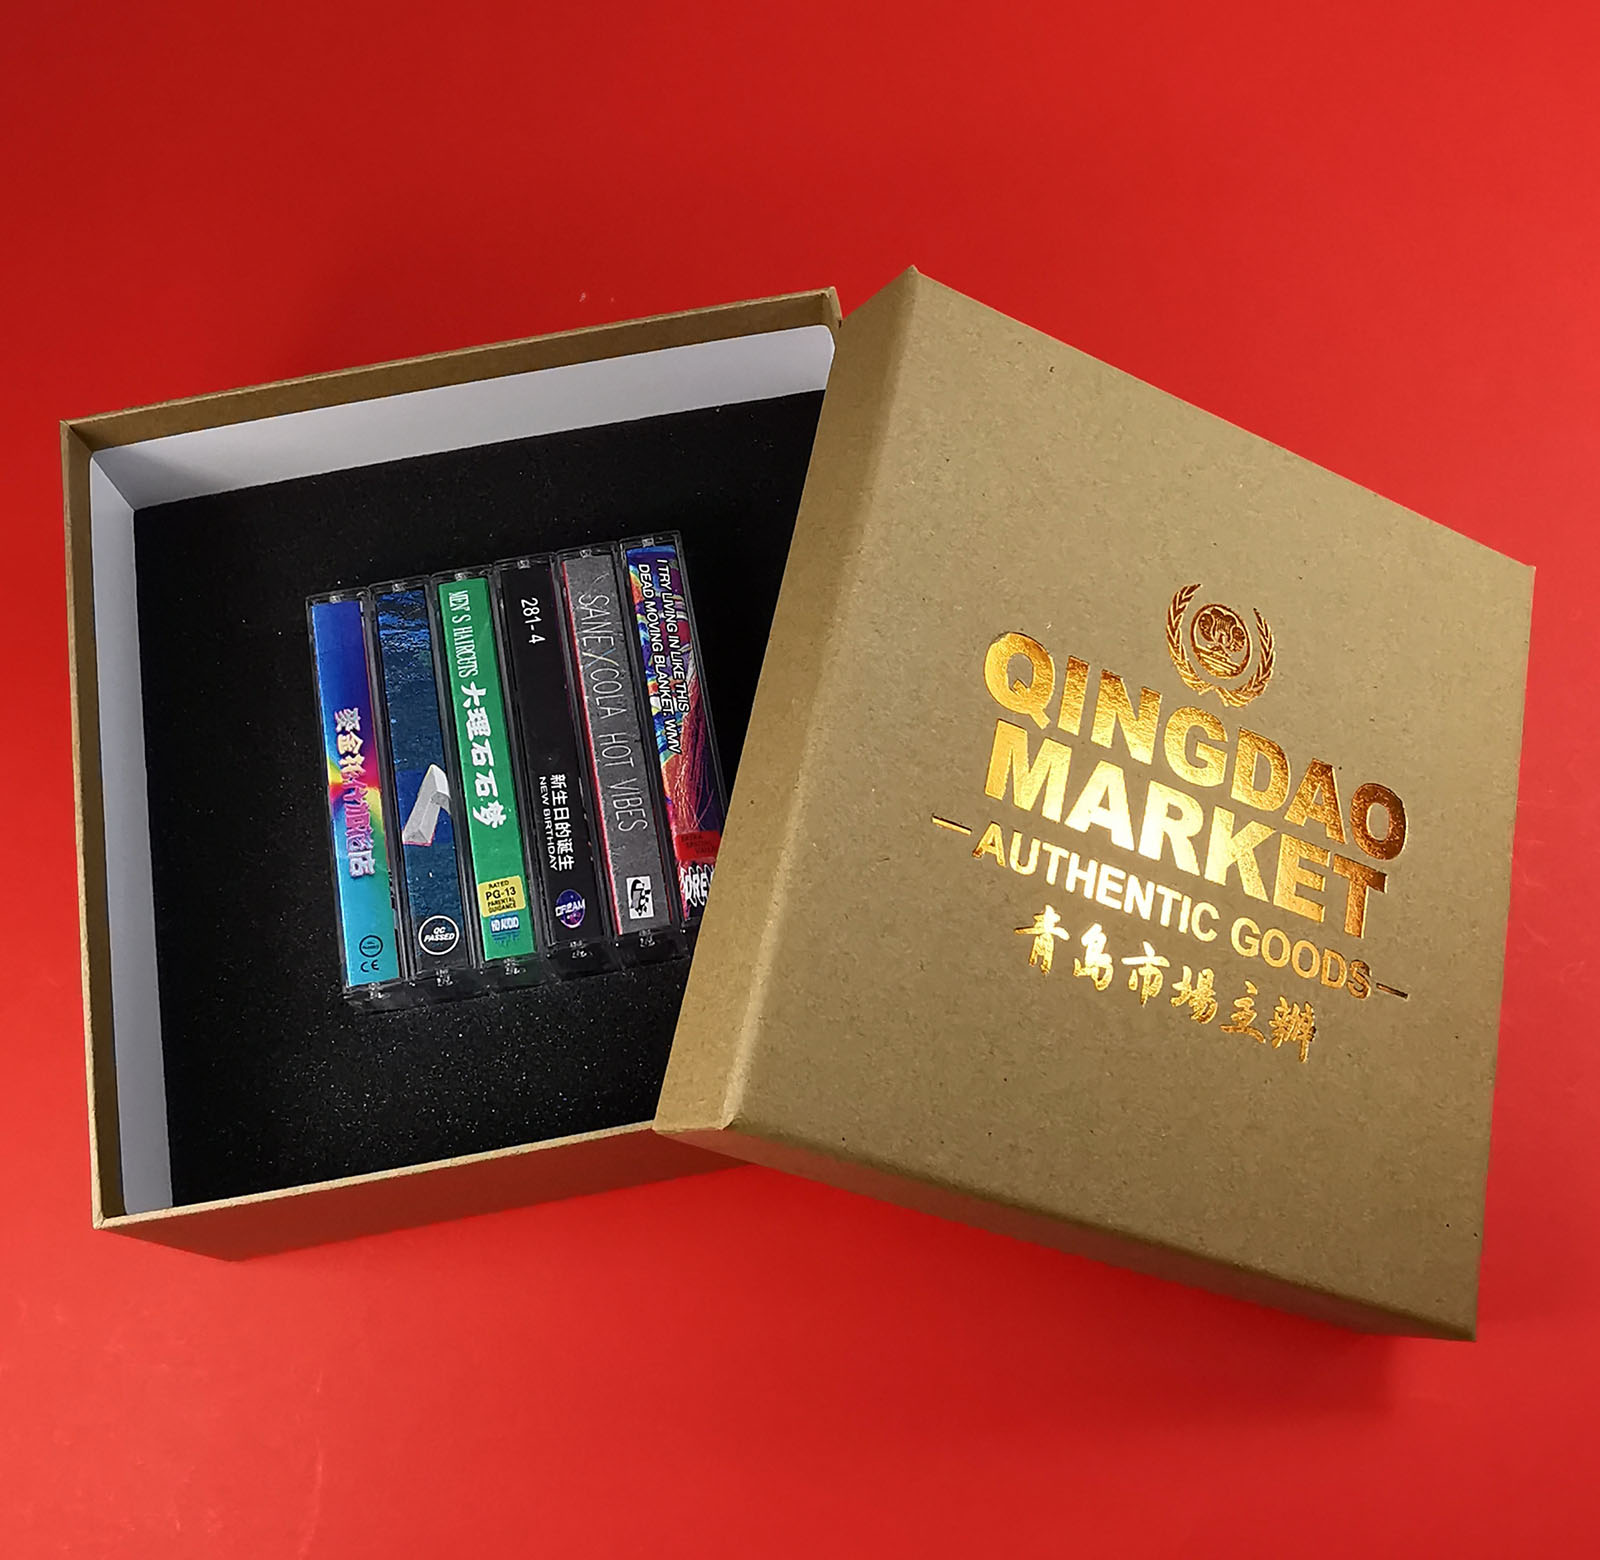 Brown Manila six tape box set with custom foam insert and orange foil lid printing